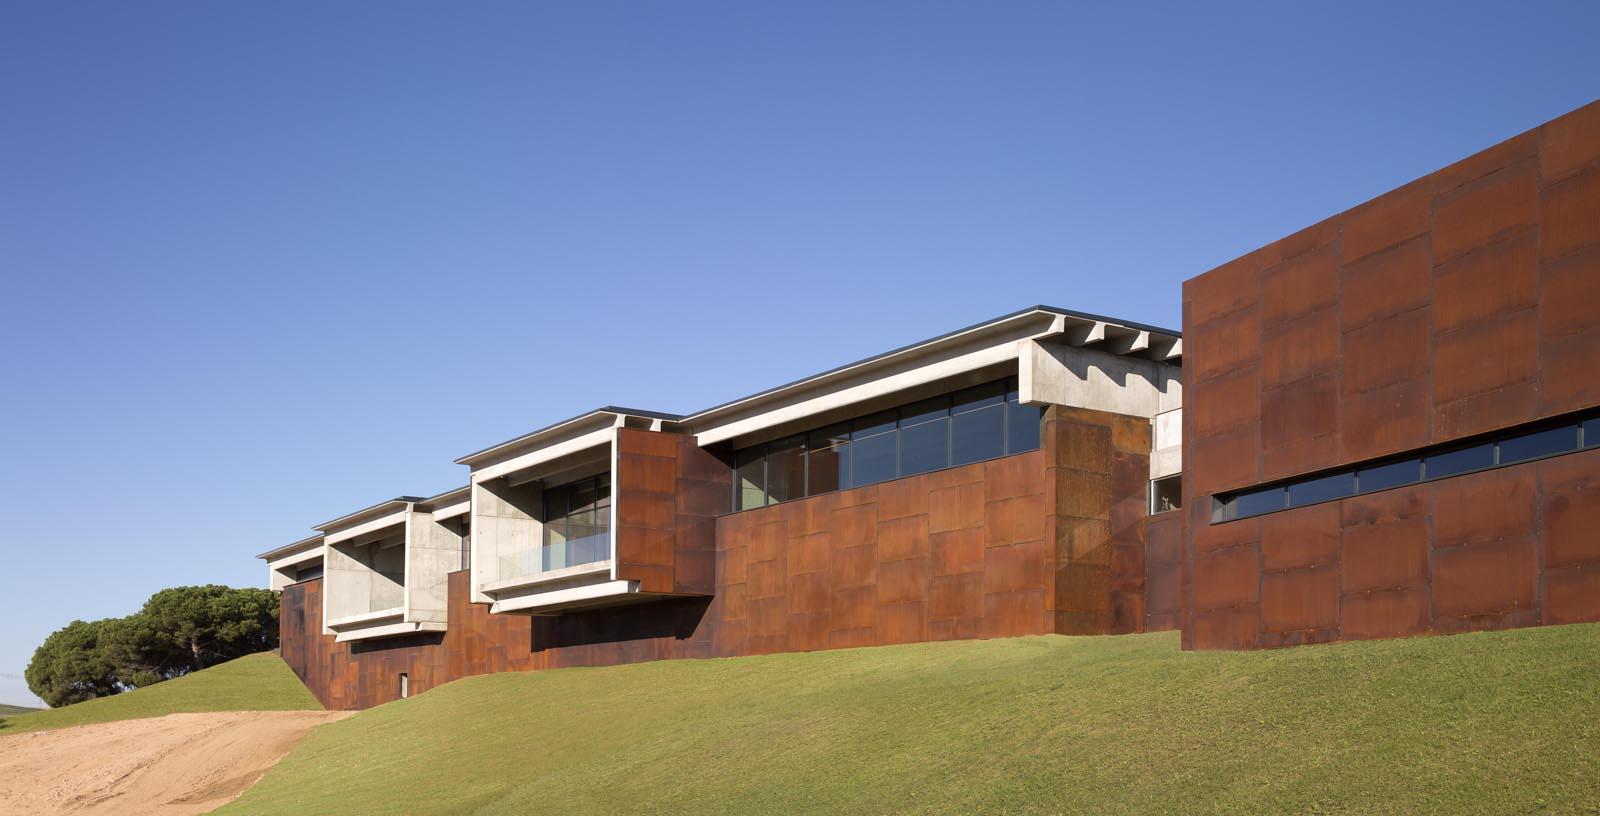 Beronia_Winery_03_Architecture_IDOM_copyright_Aitor_Ortiz